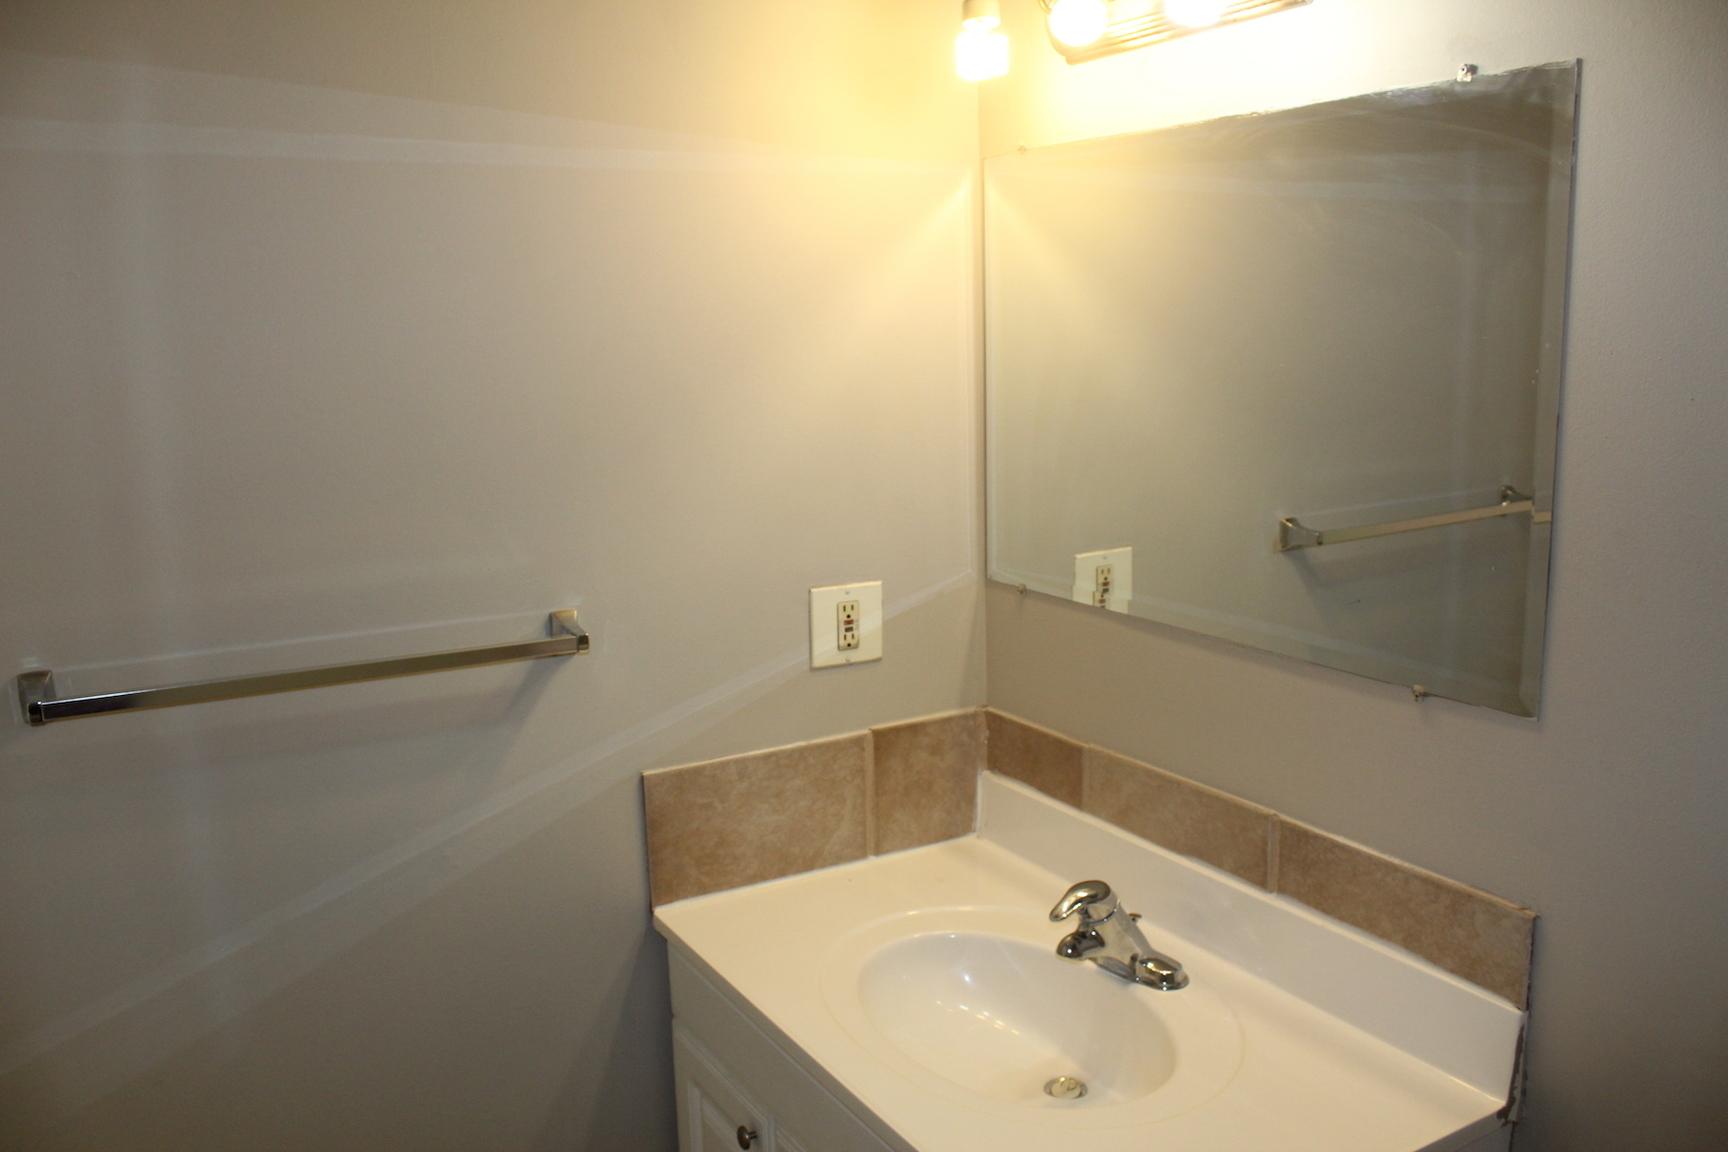 11920 82 Street NW, Edmonton, AB - $1,275 CAD/ month